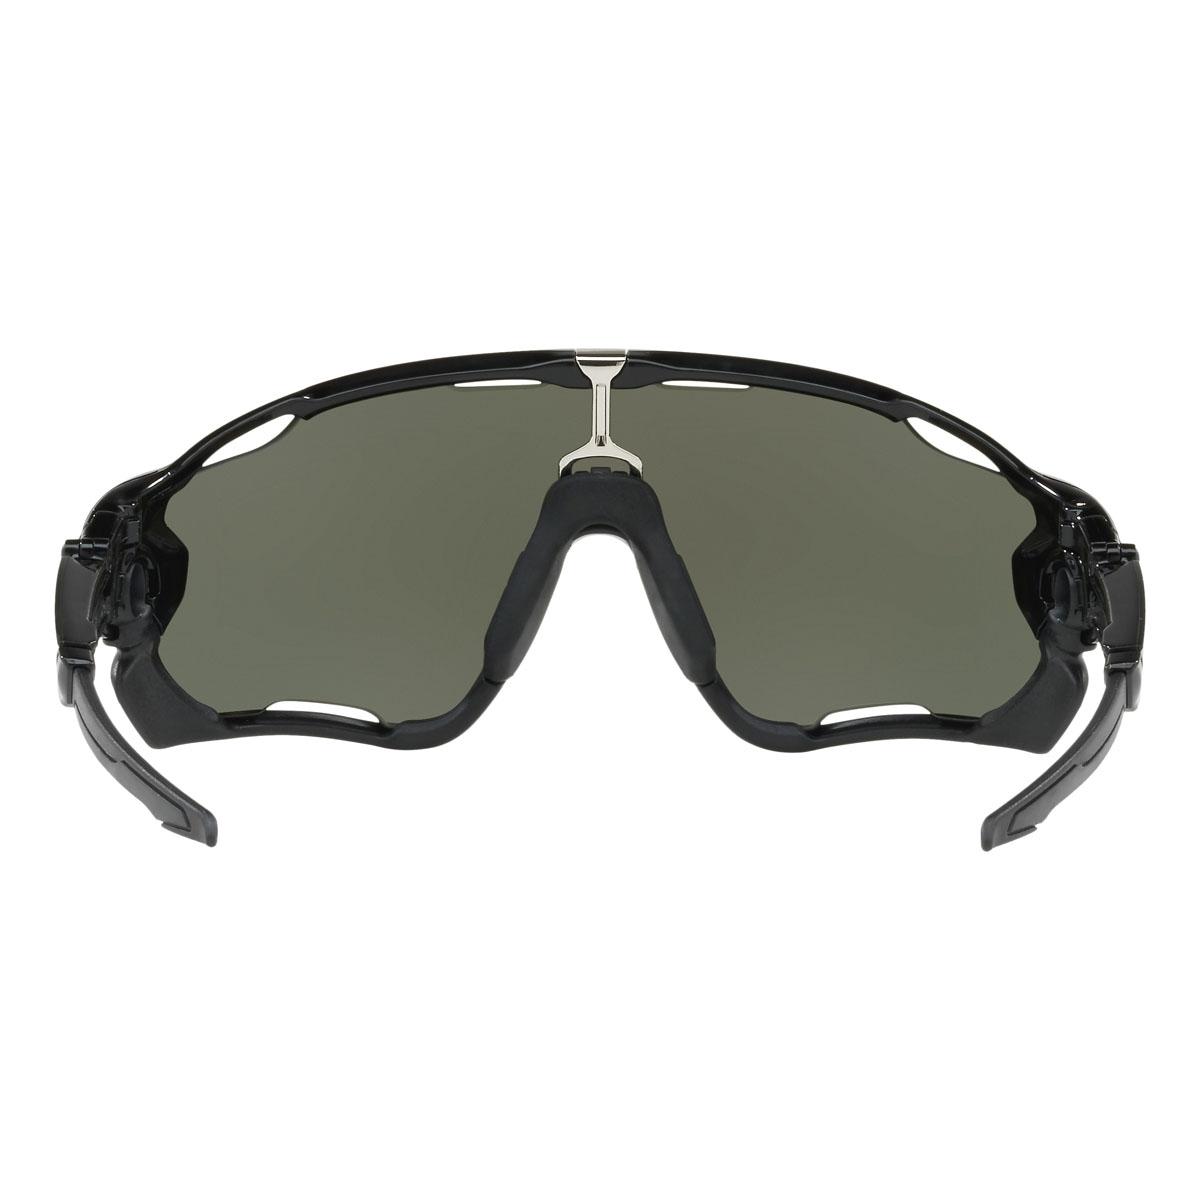 46e8ad932f4 ... Image of Oakley Jawbreaker Prizm Polarised Sunglasses - Polished Black  Frame Prizm Black Polarized Lens ...